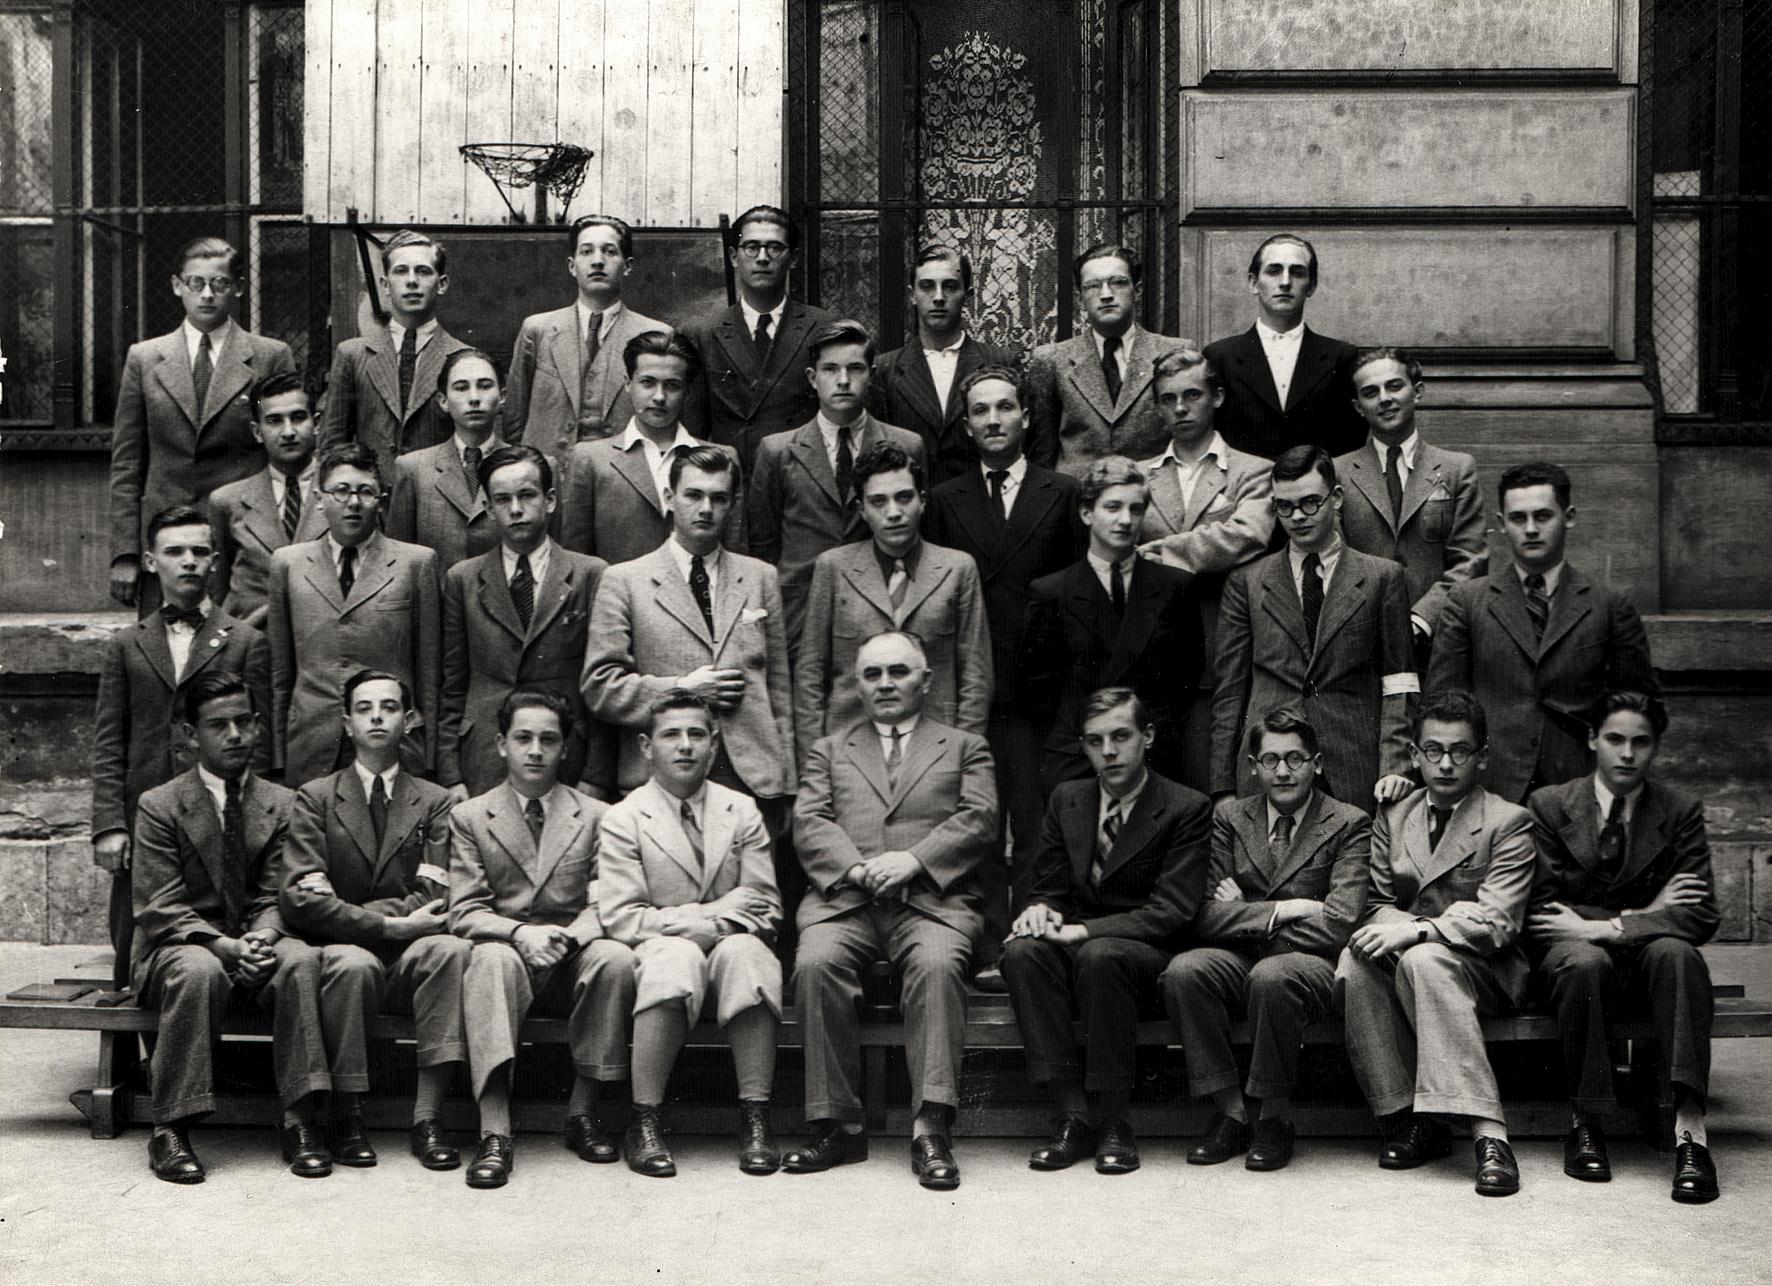 Gyorgy Preisz's class photo